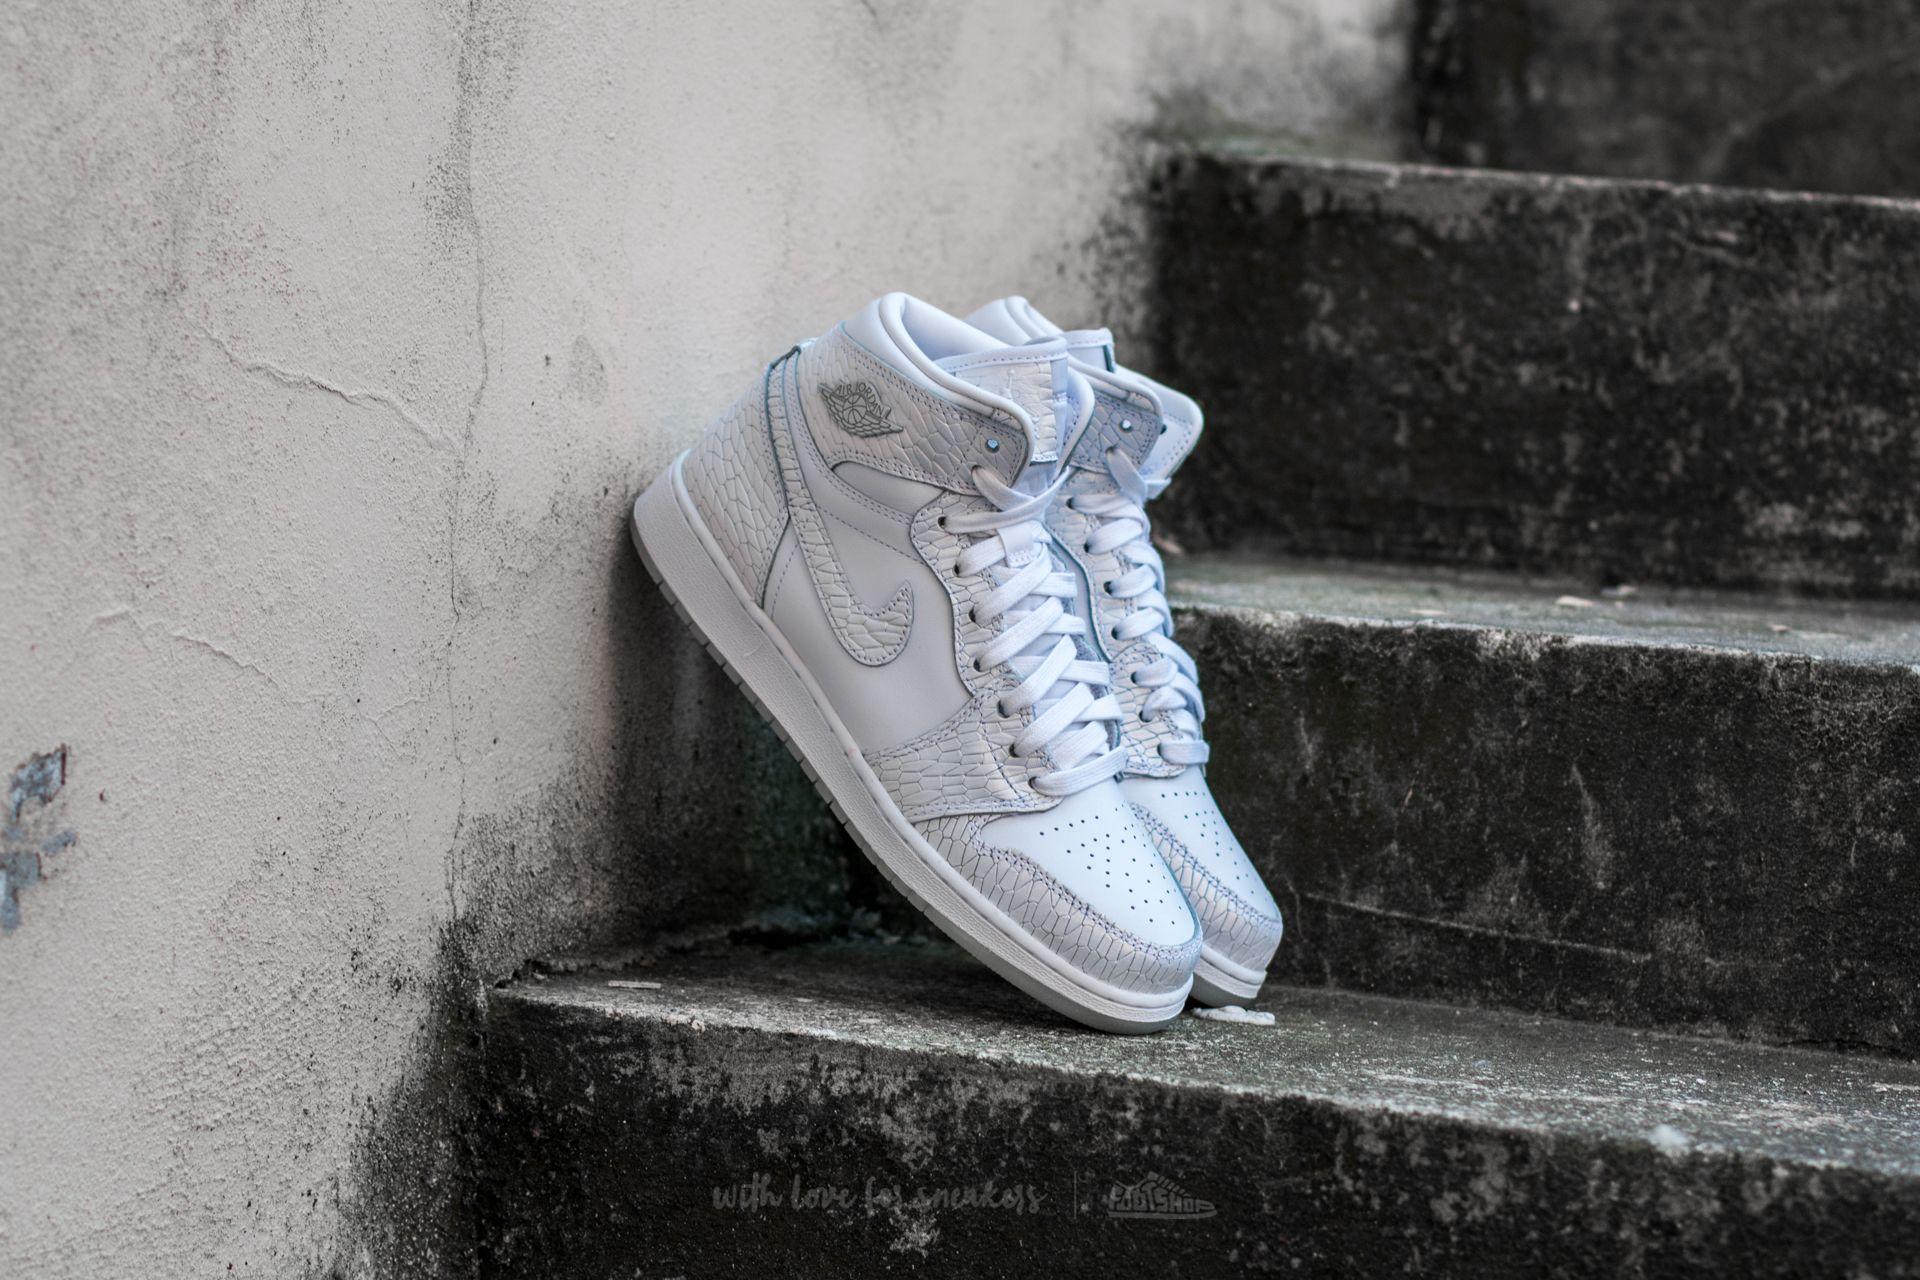 designer fashion 032f5 3d867 Air Jordan 1 Retro Hi Premium HC GG